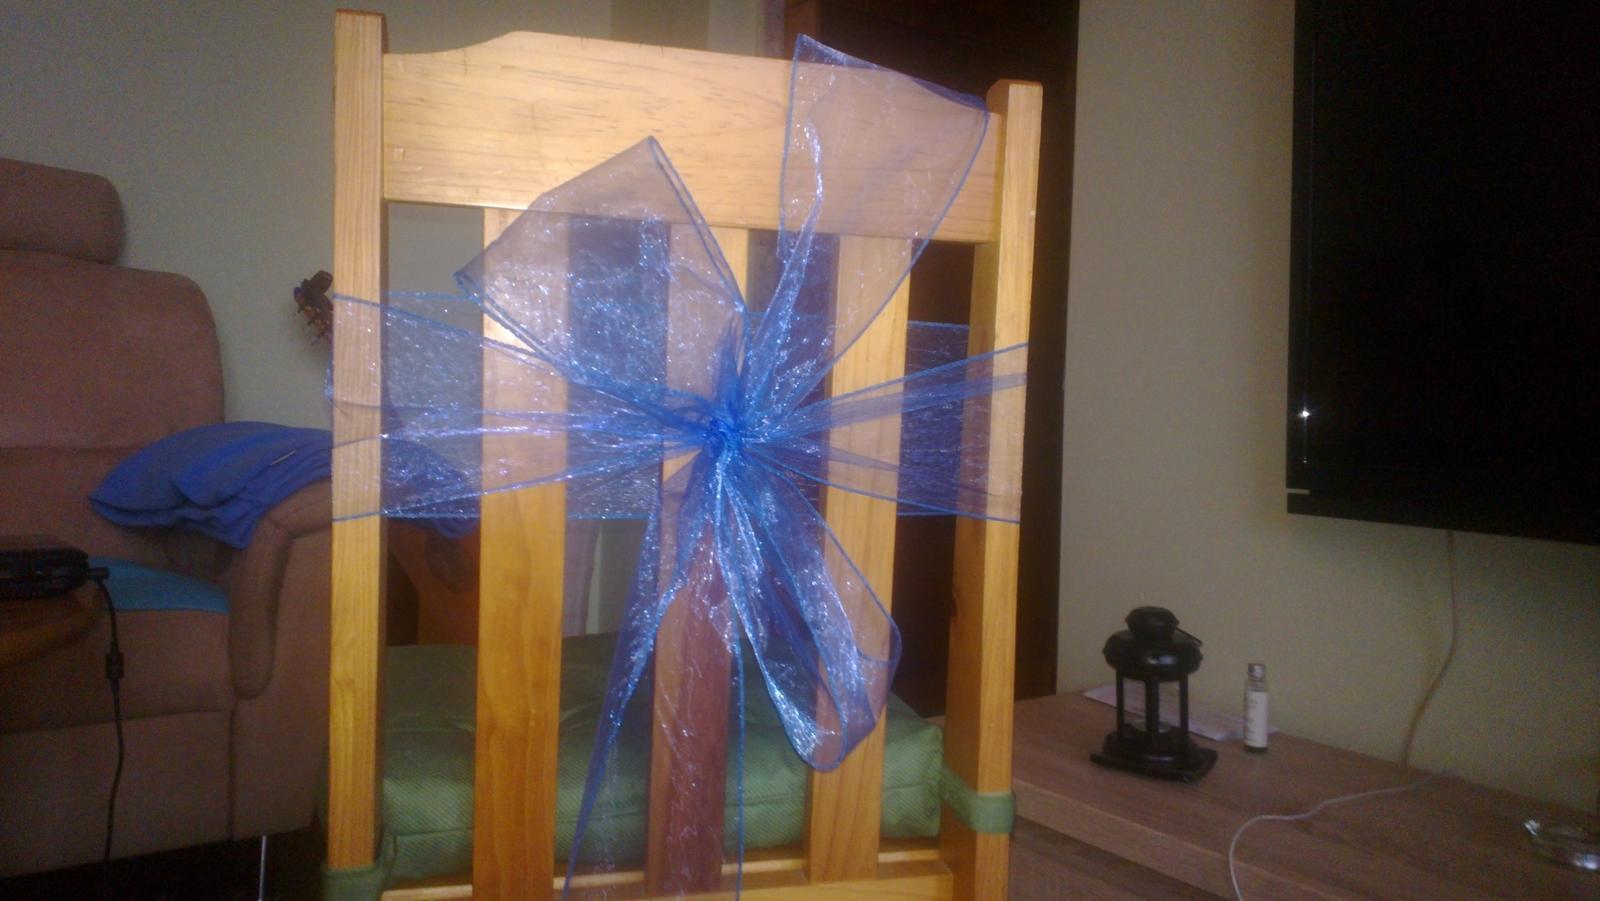 Svatebni Dekorace Kralovska Modra 2 30 Kc Svatebni Bazar